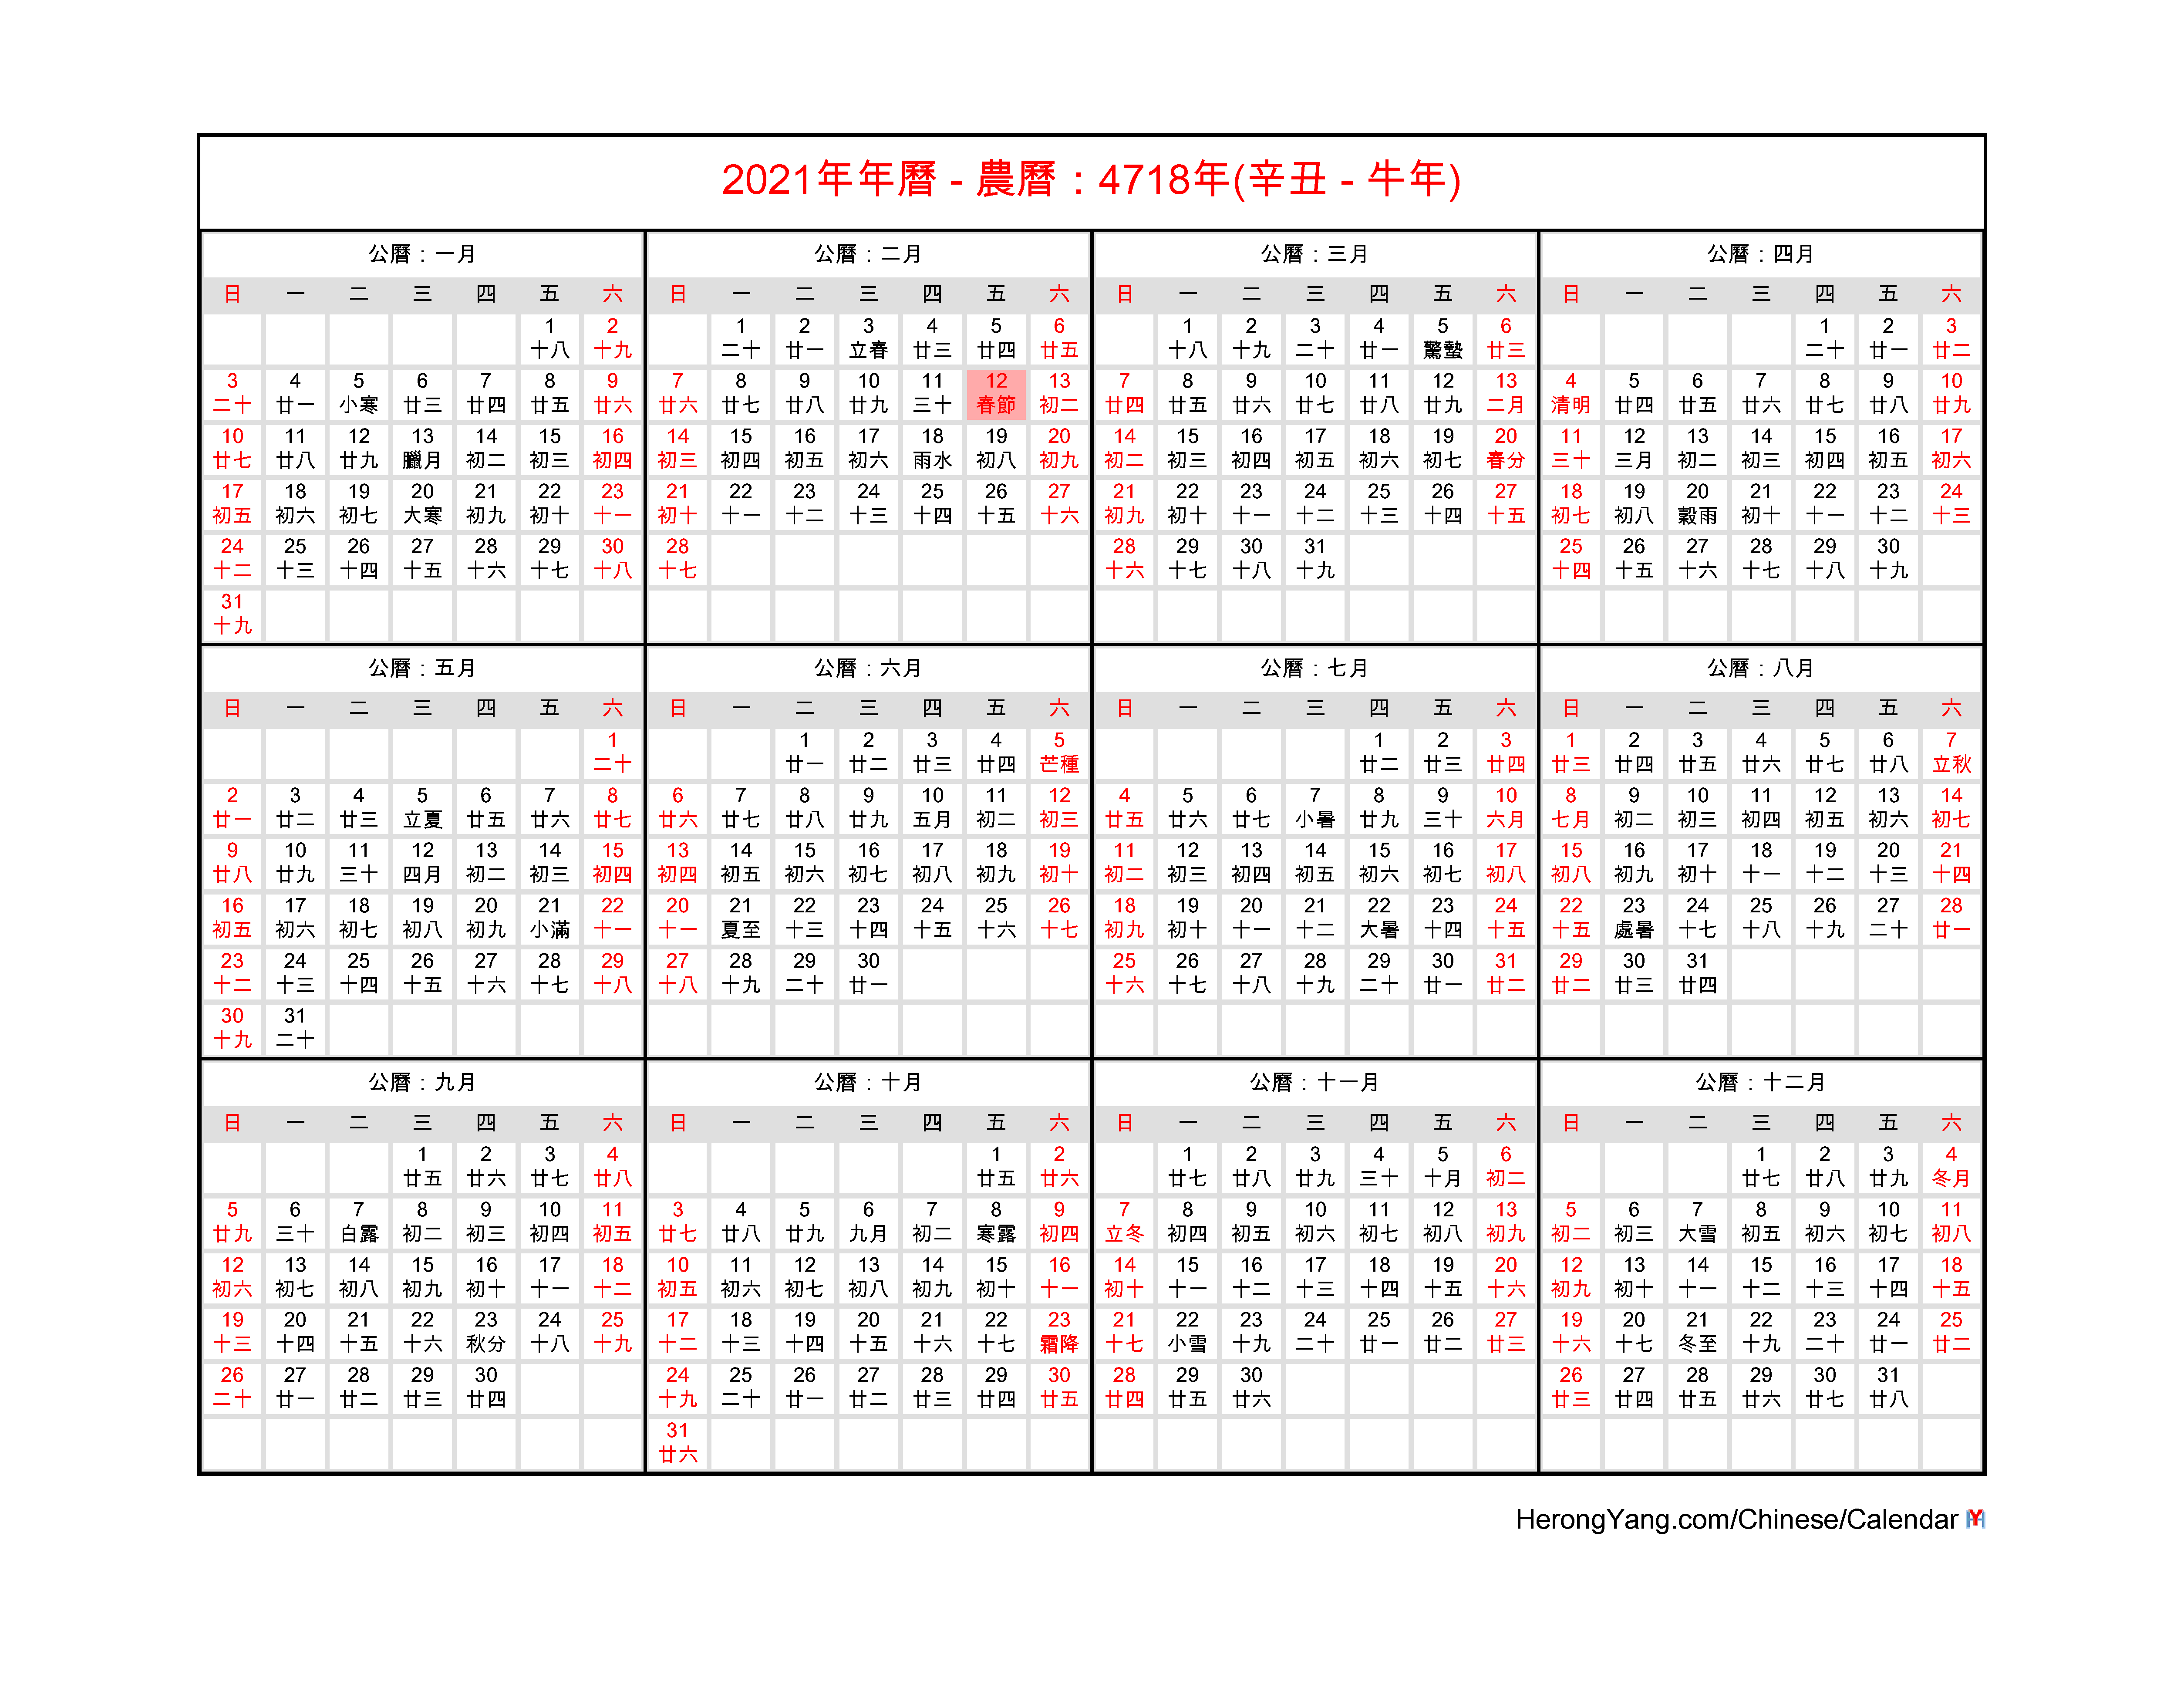 Uml Calendar Spring 2022.Free Chinese Calendar 2021 Year Of The Ox